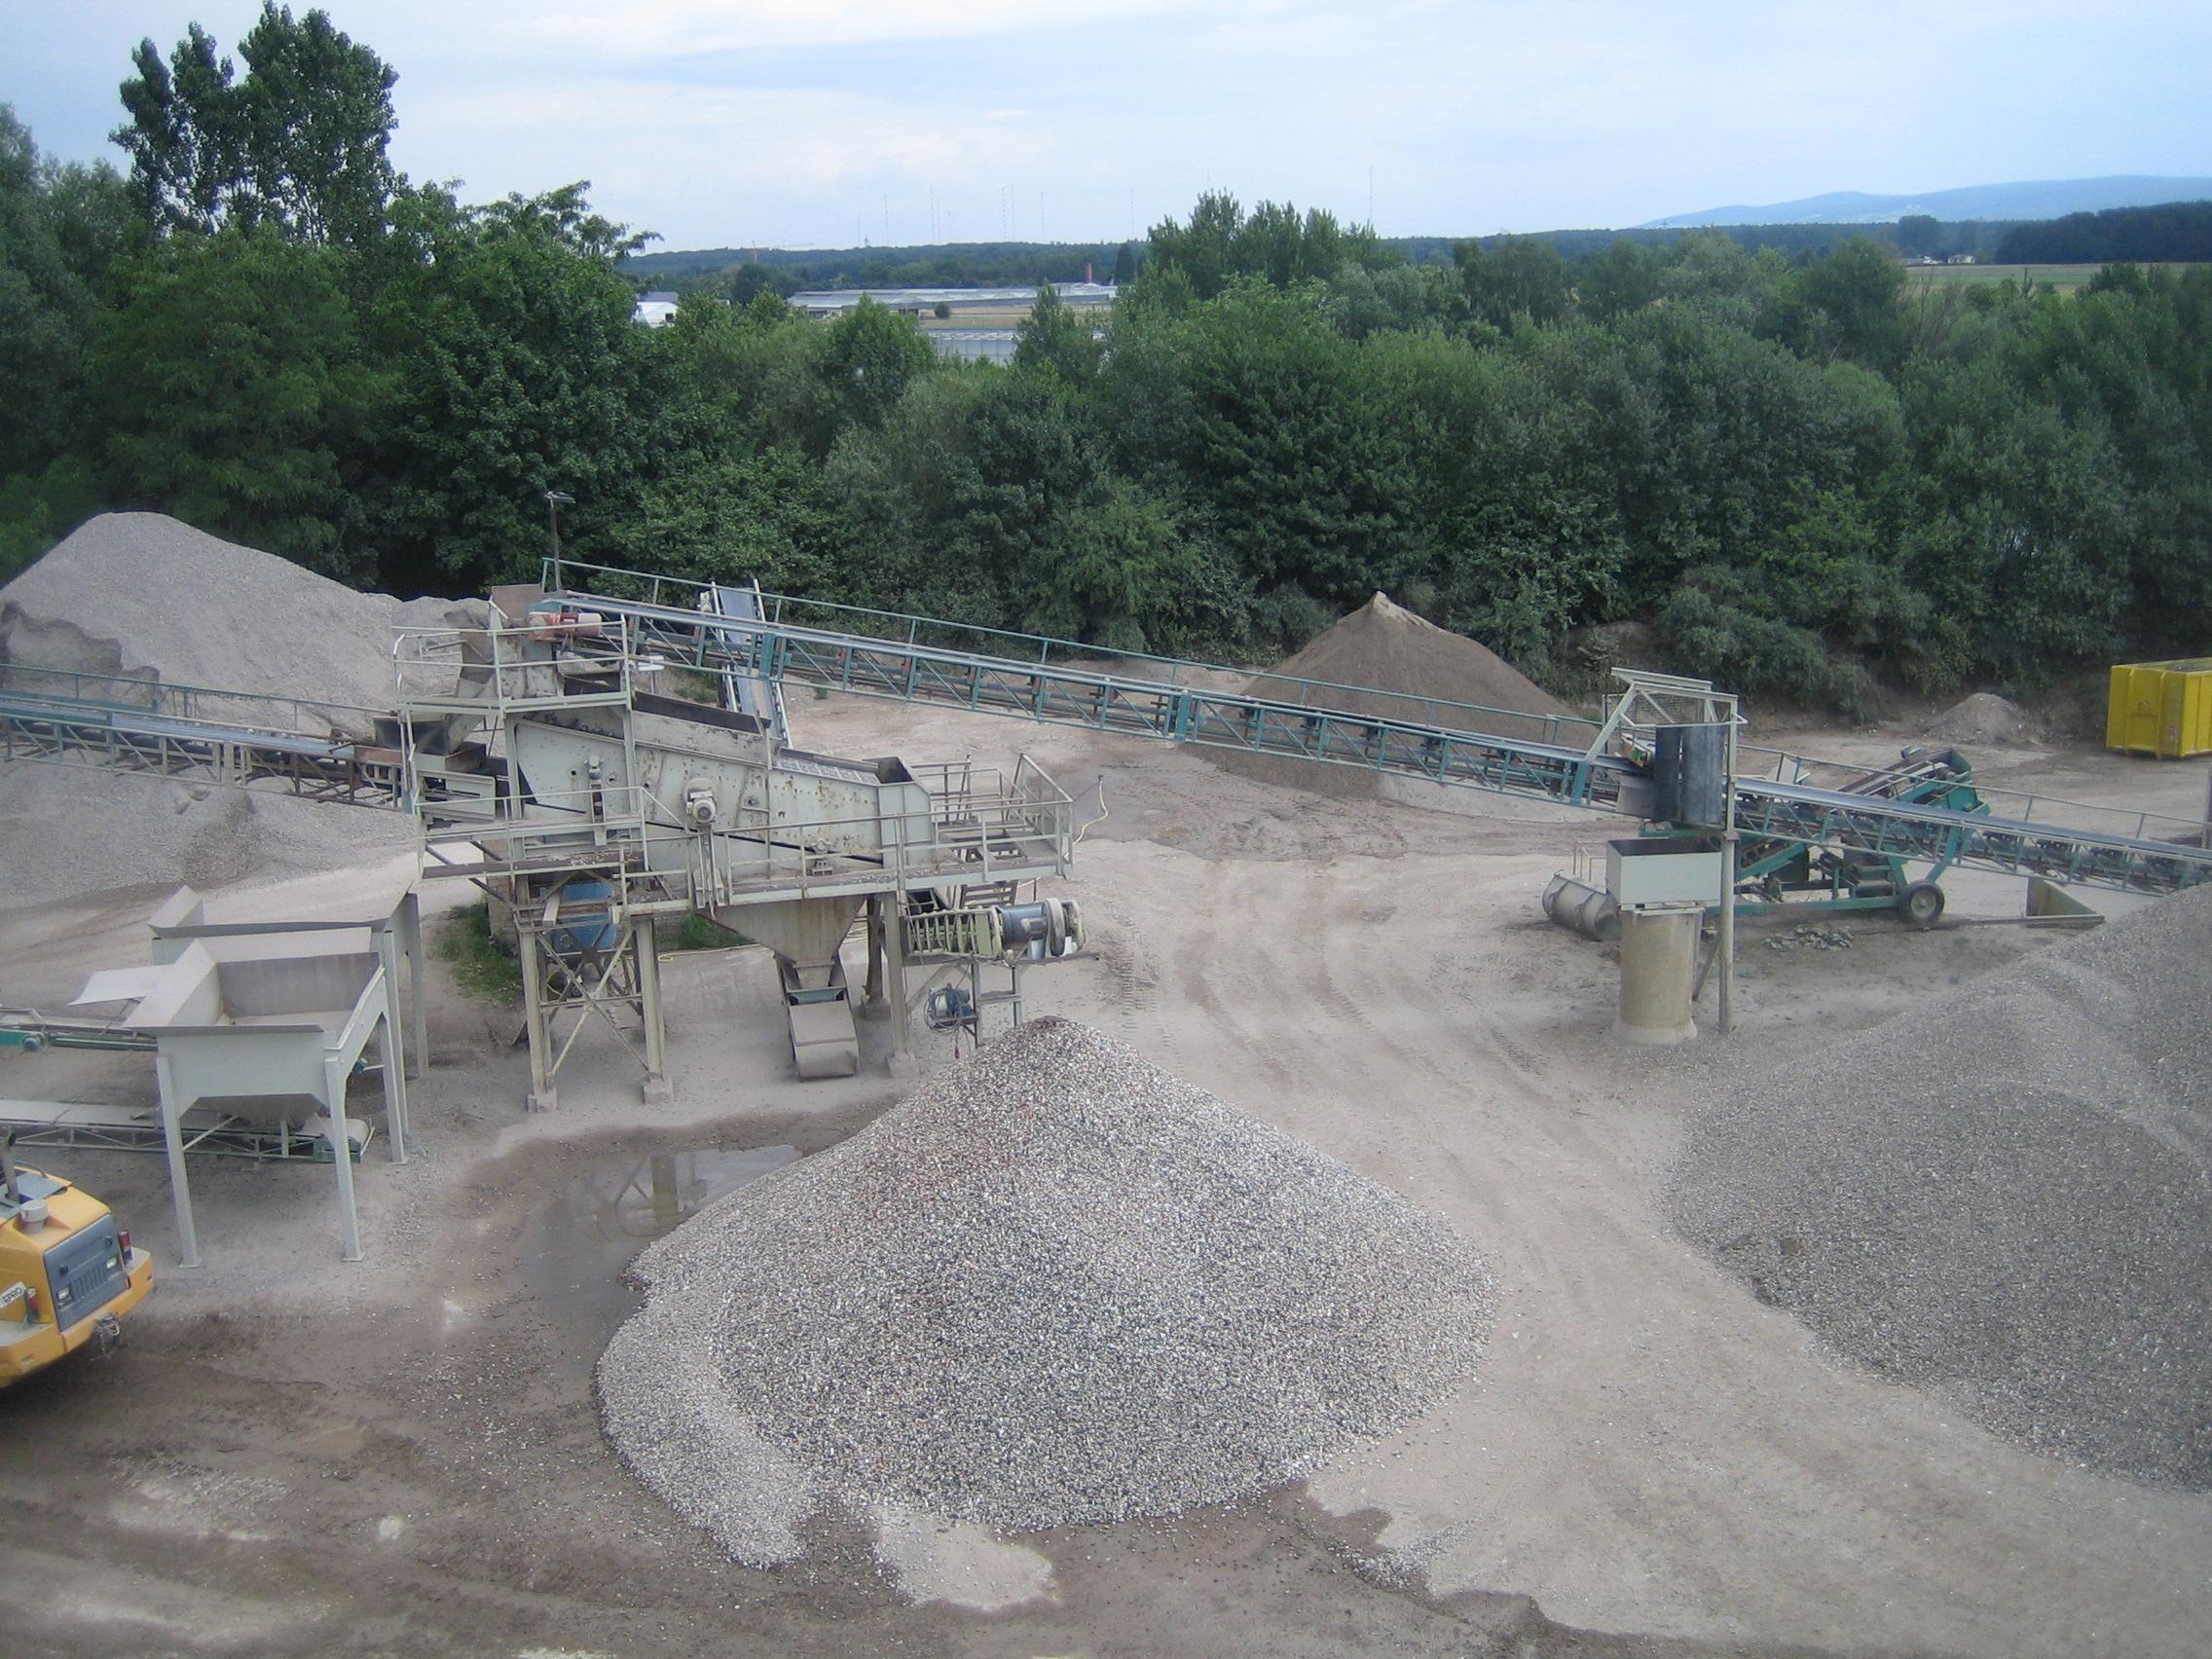 Baustoffrecycling Vepro GmbH